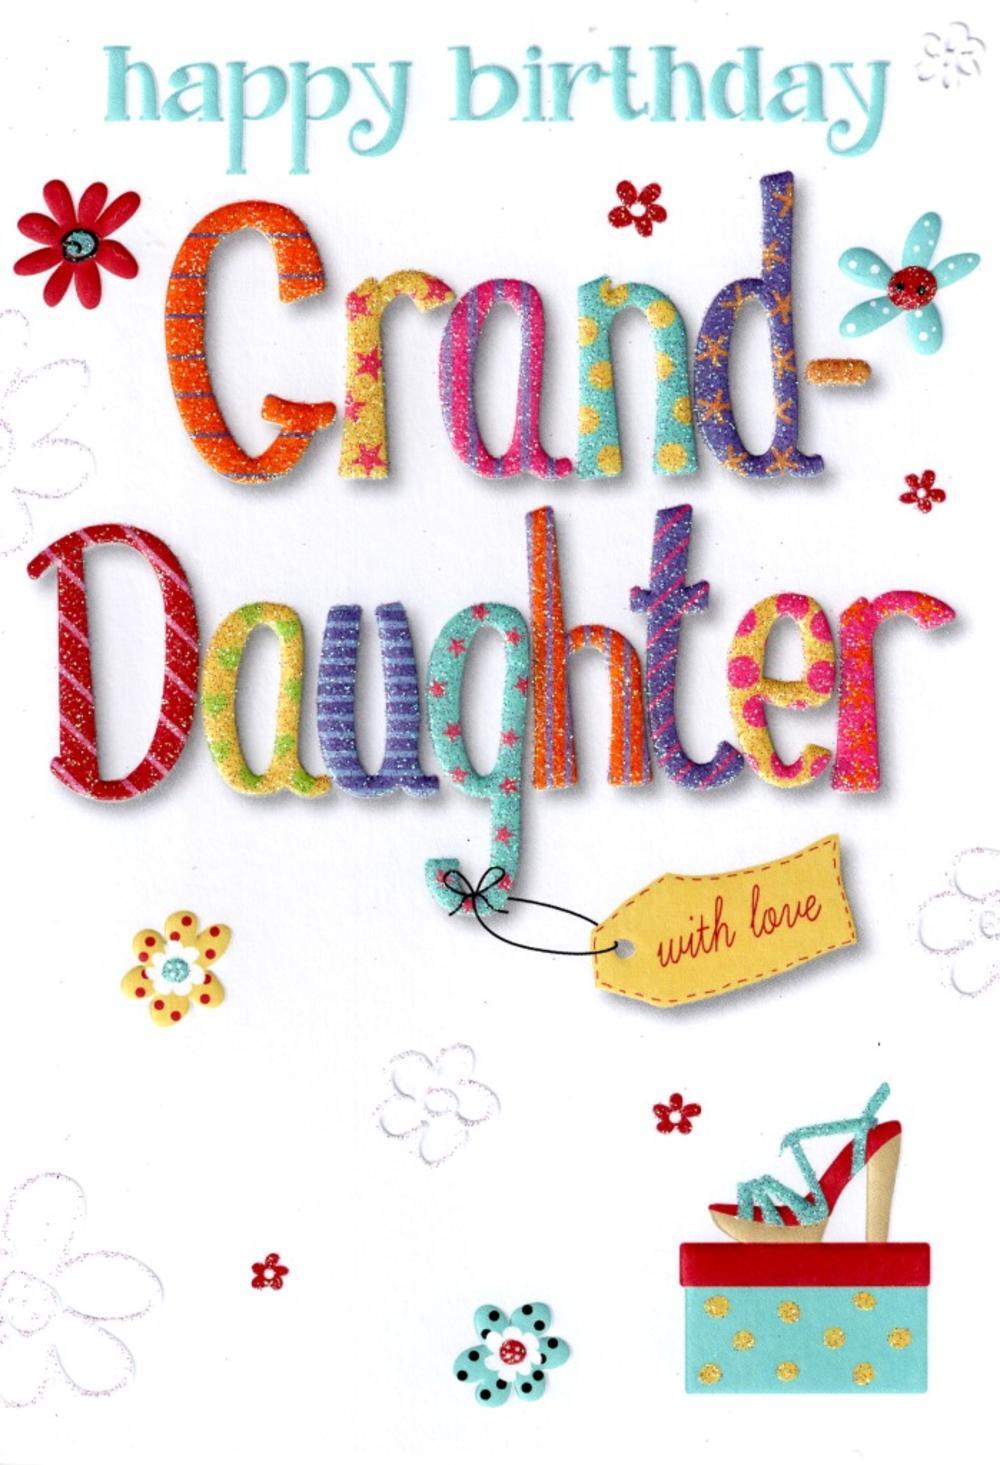 Granddaughter Lovely Birthday Card